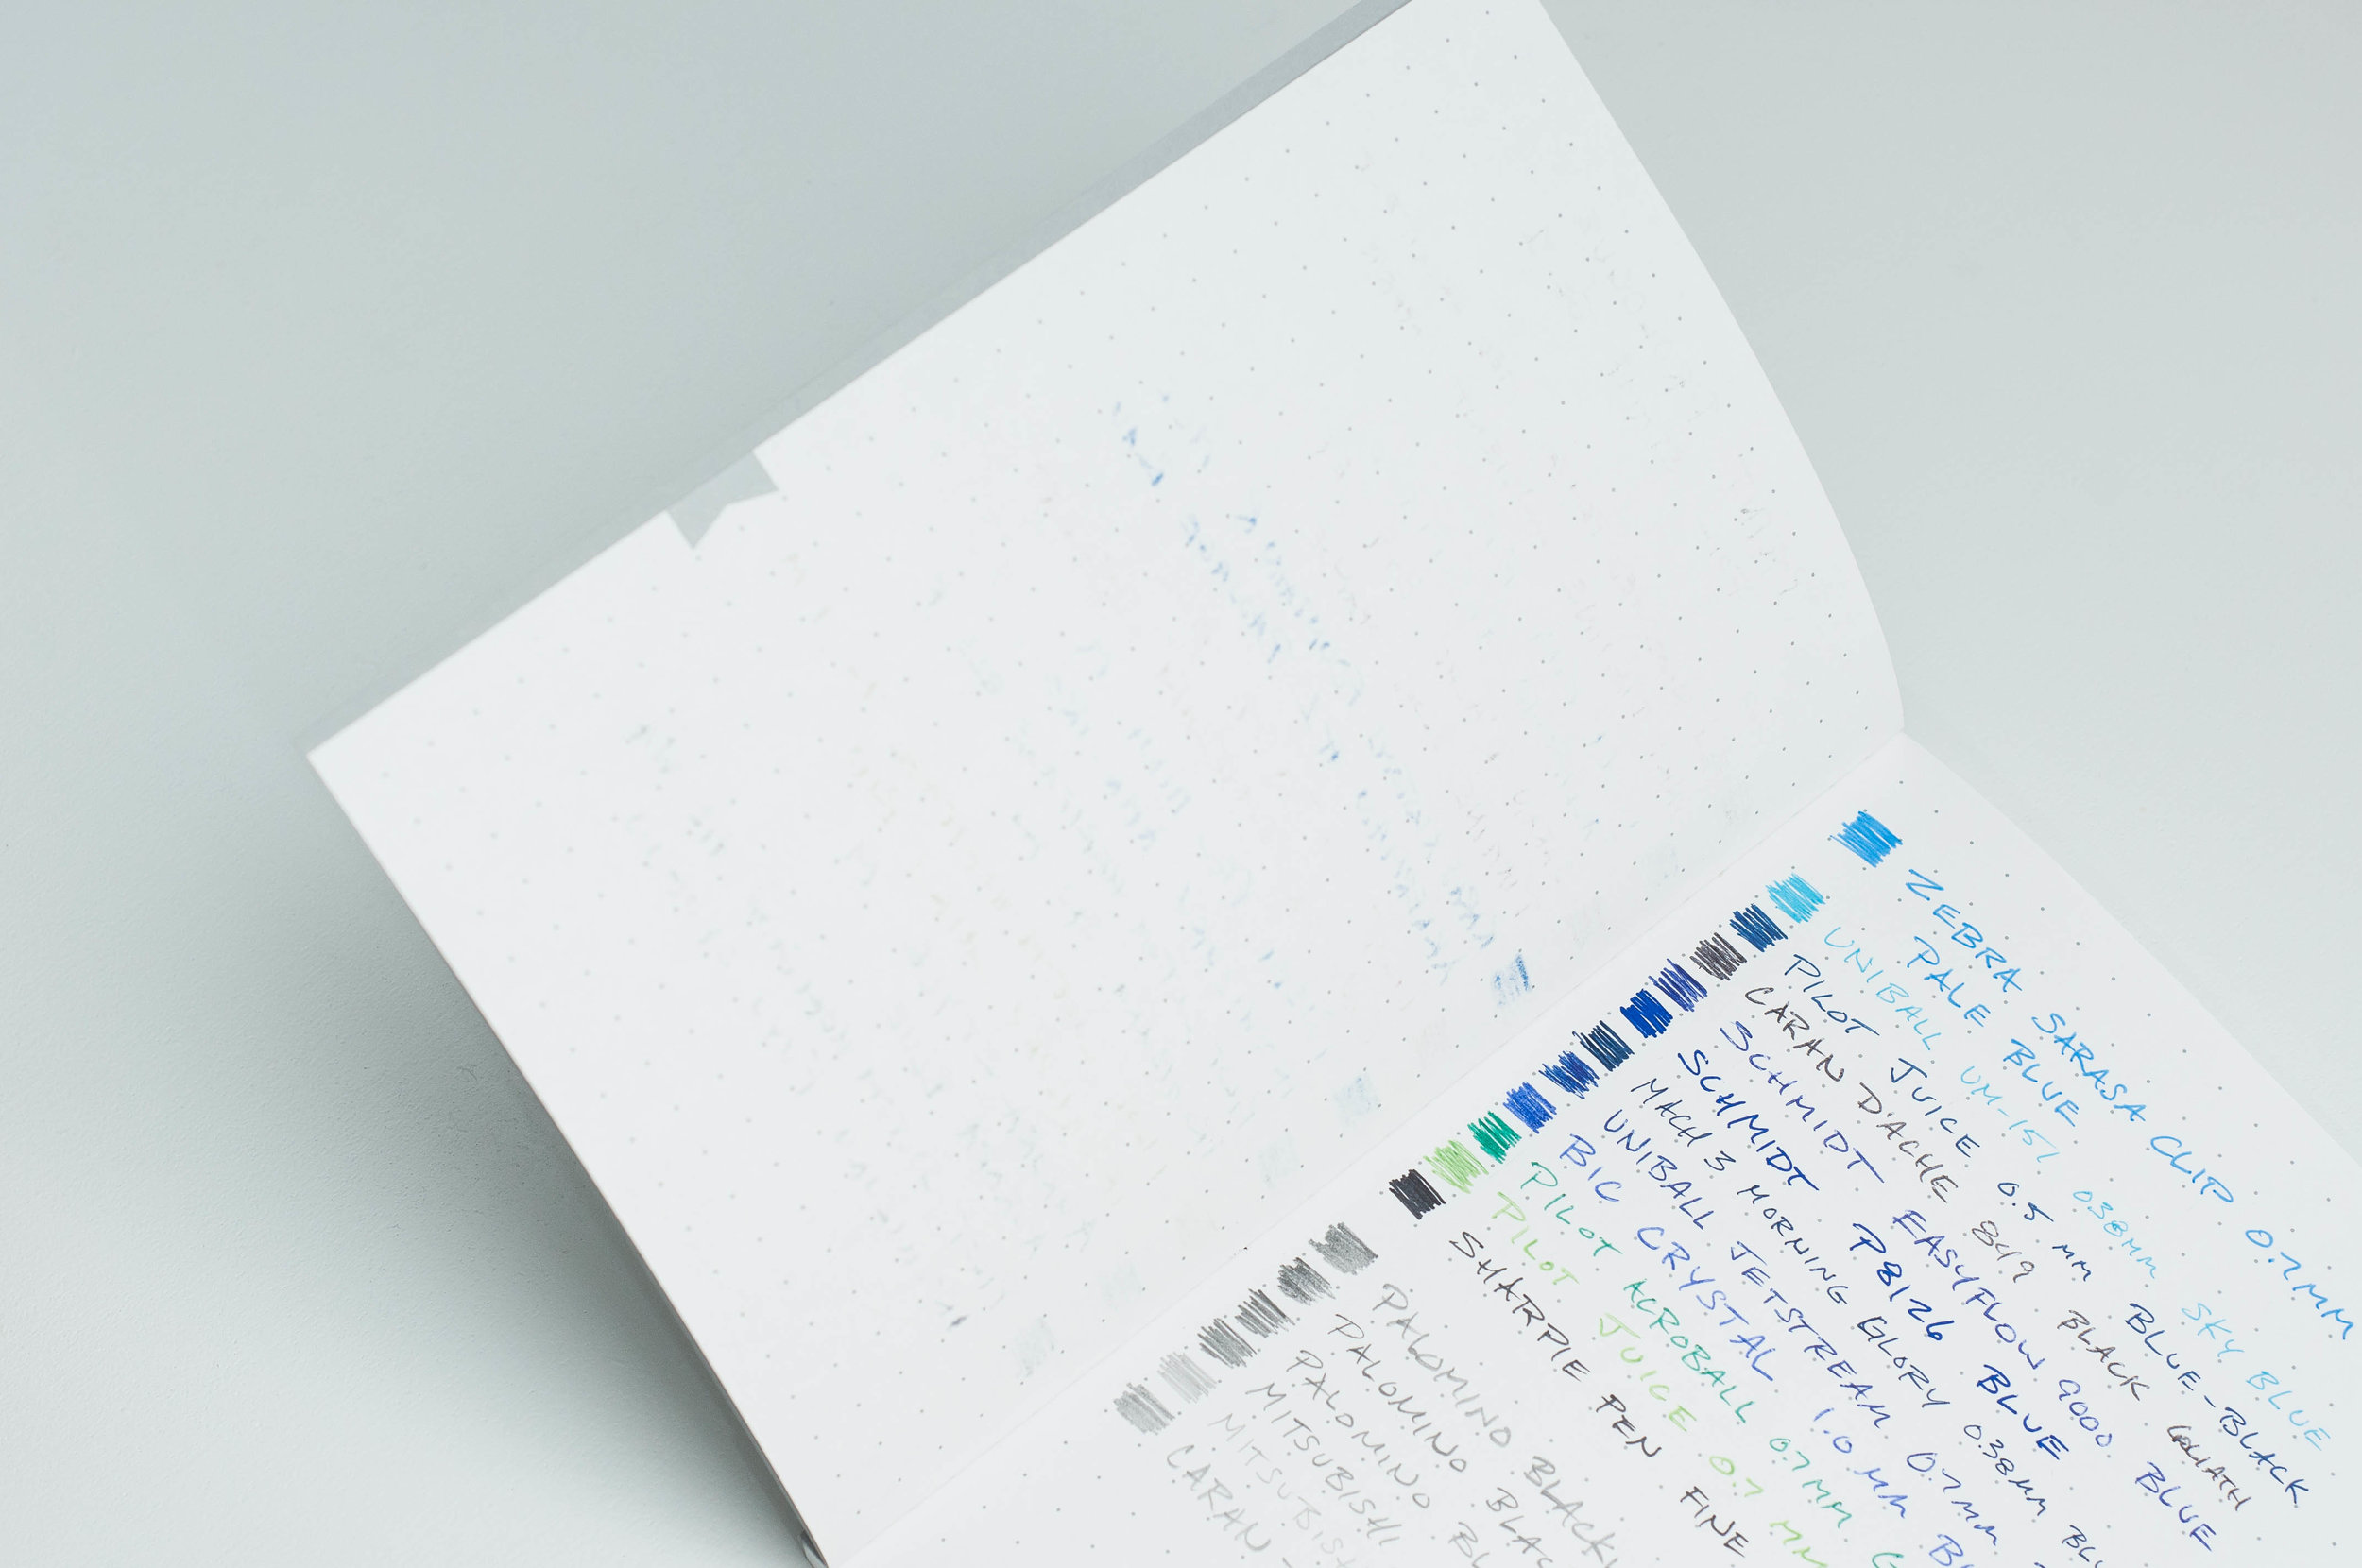 Print Prologue Notebook writing back